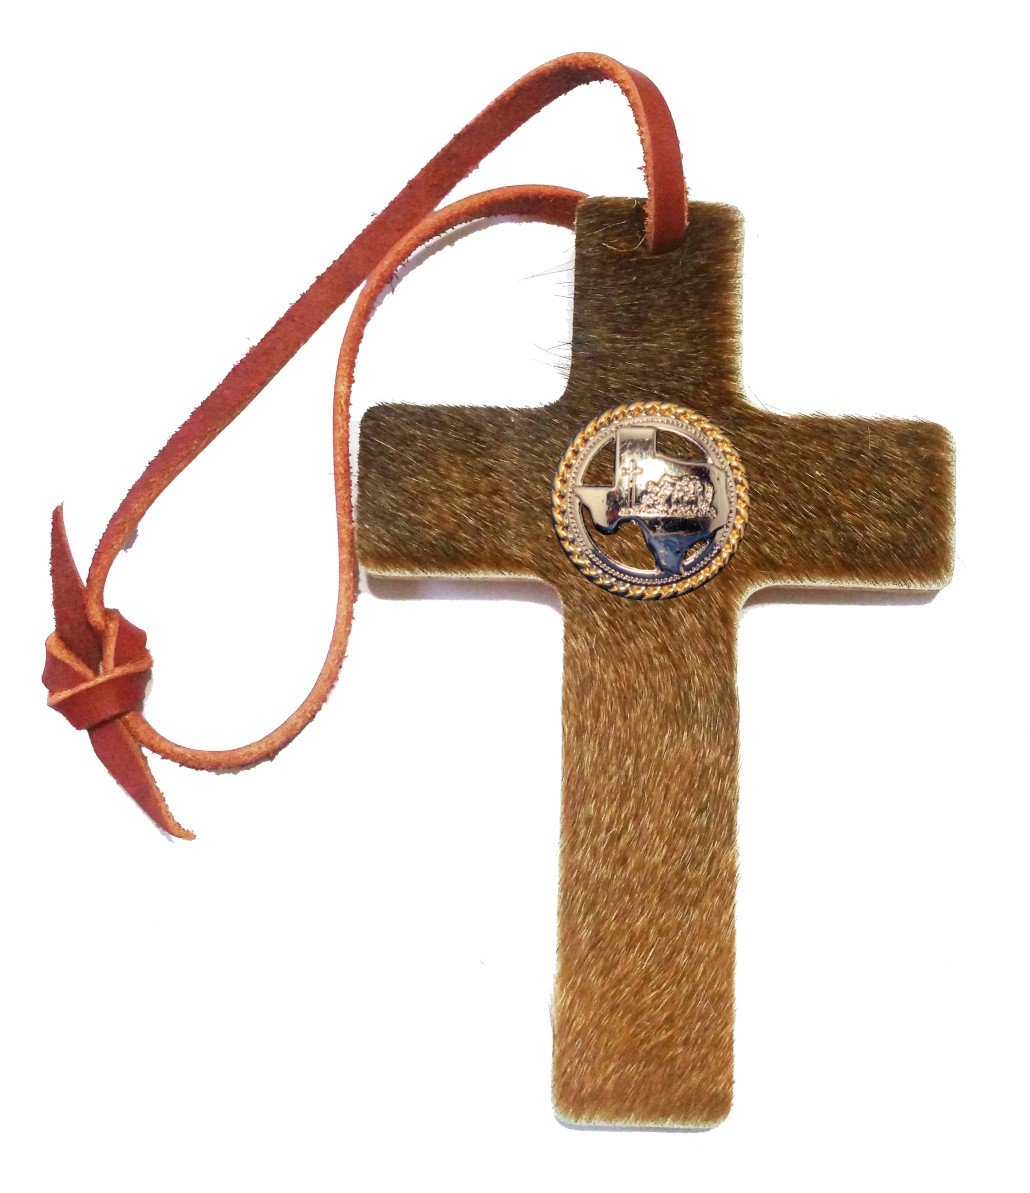 Custom Texas Cowboy Church Praying Cowboy Hair on Hide Leather Saddle Cross. Made in Texas by Texans